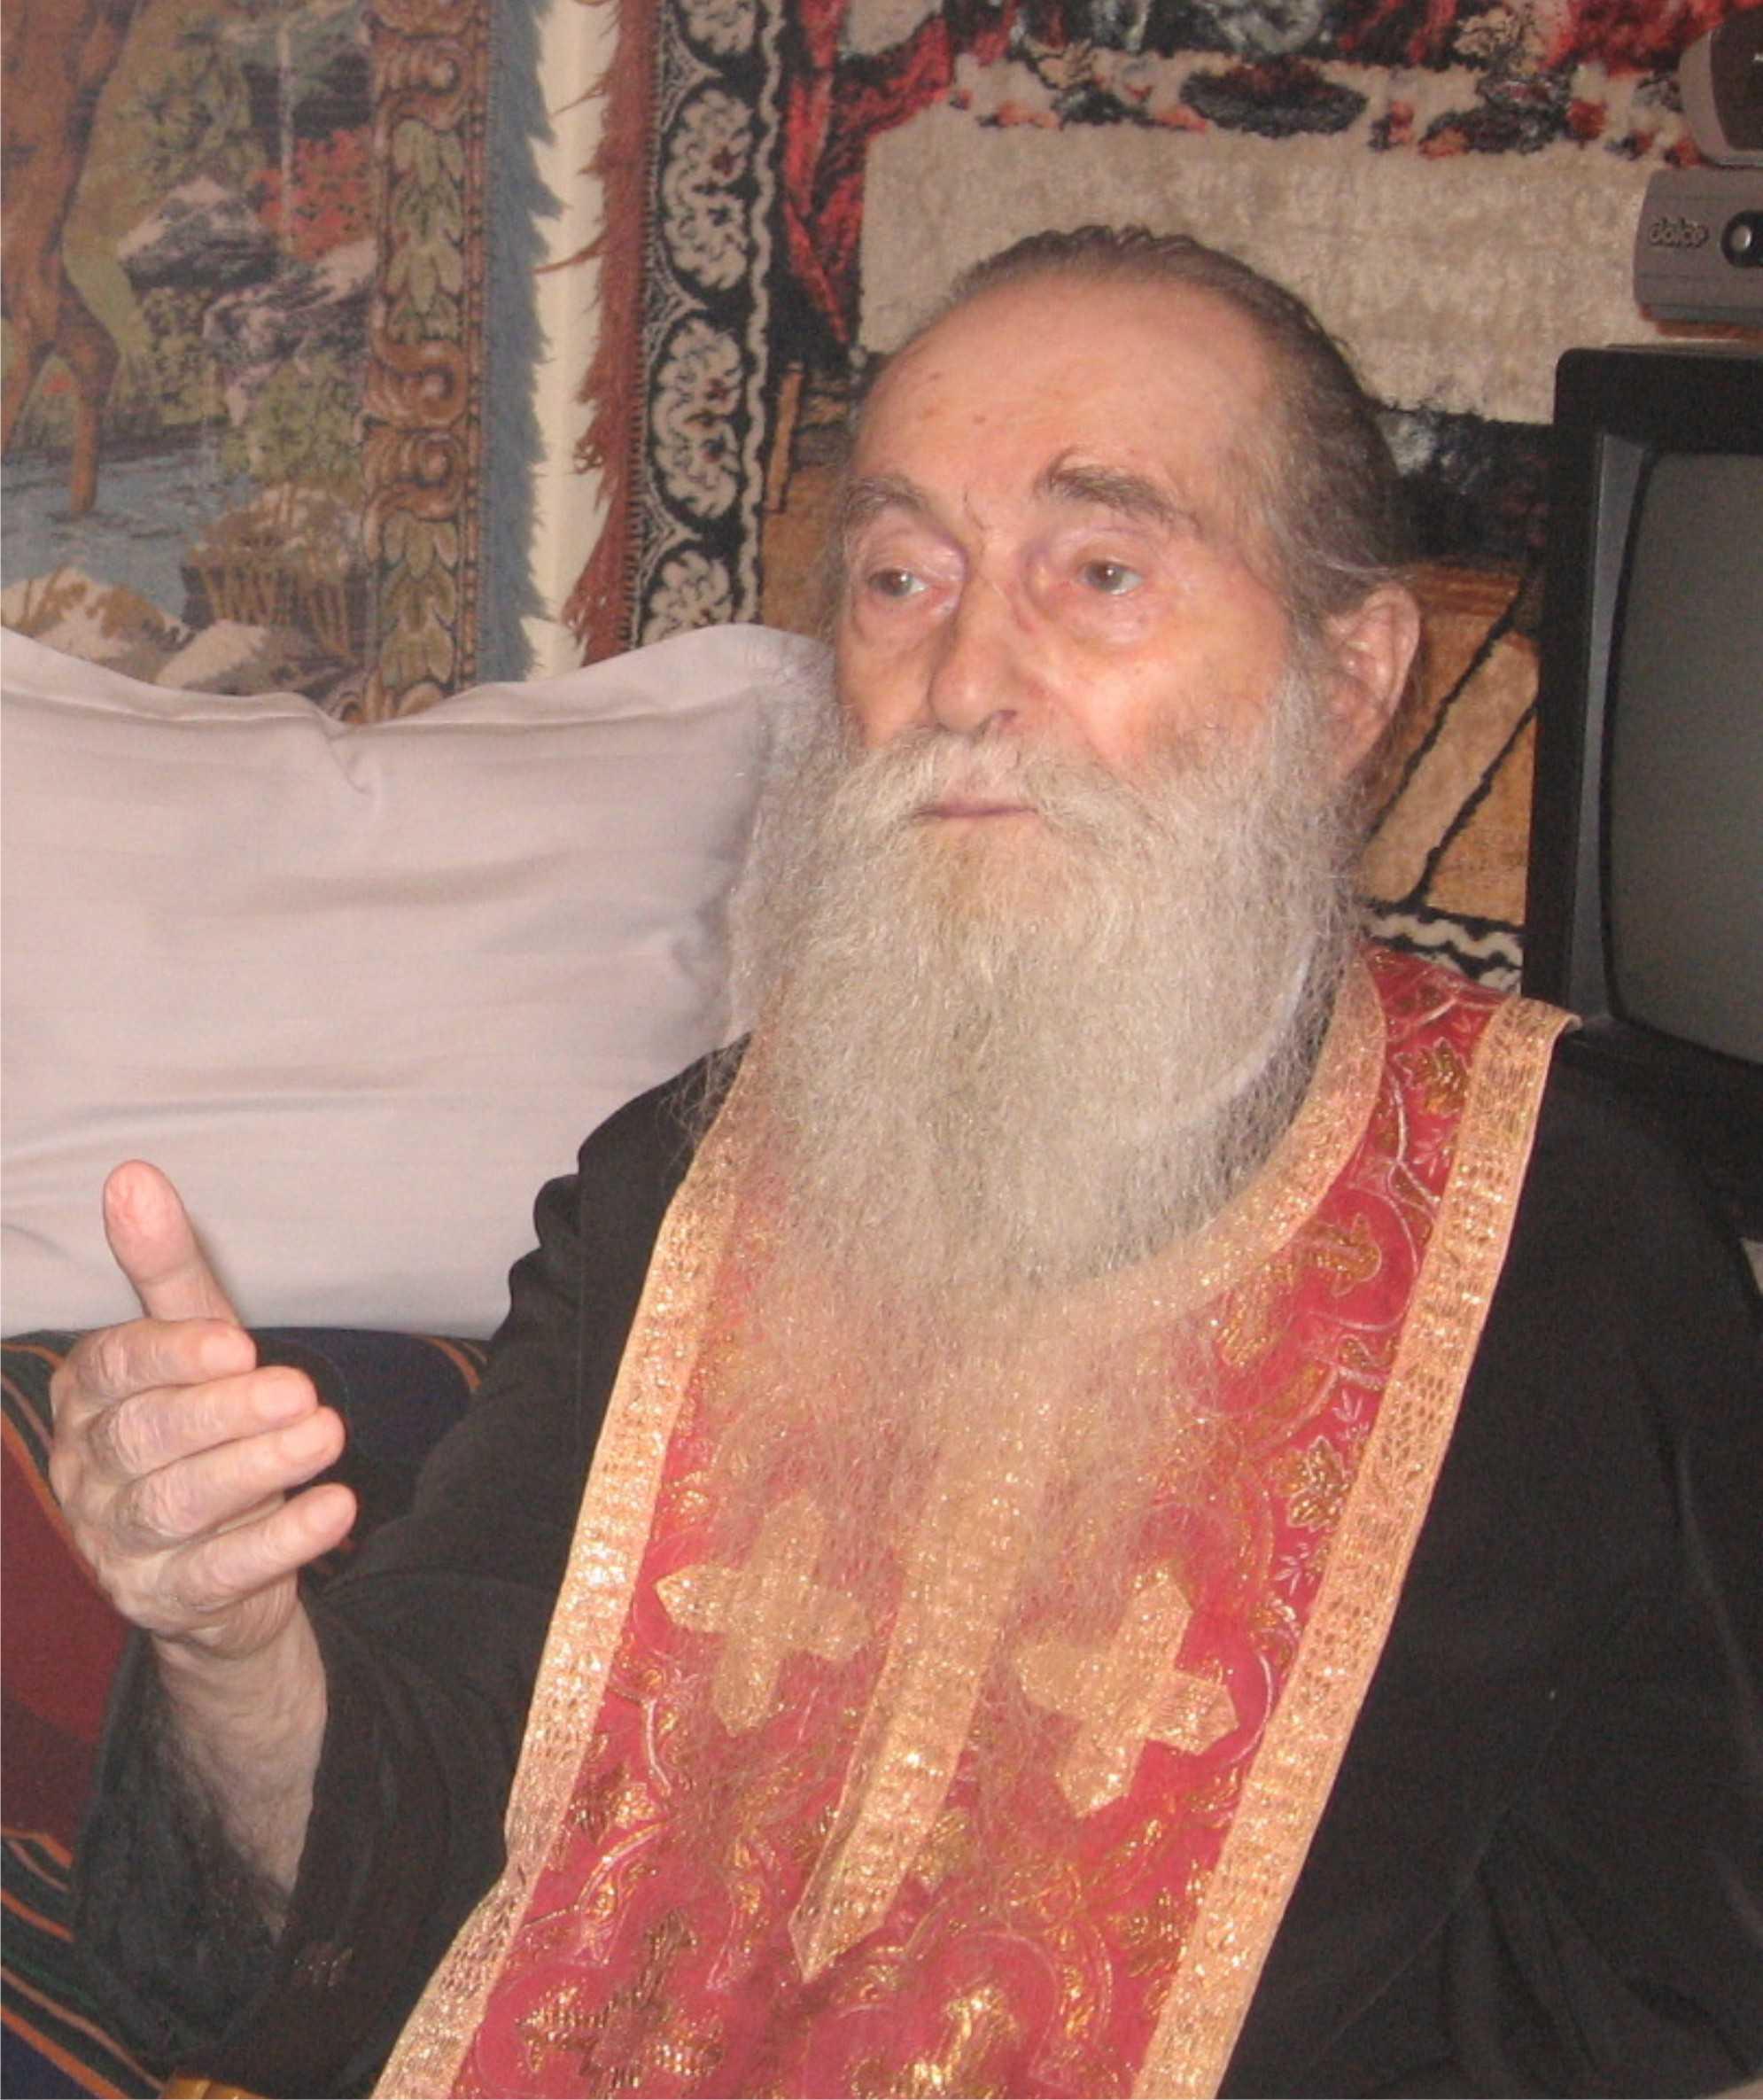 Parintele Arsenie Papacioc: <i>&#8220;Omule, daca ti-ai cunoaste valoarea!&#8221;</i>